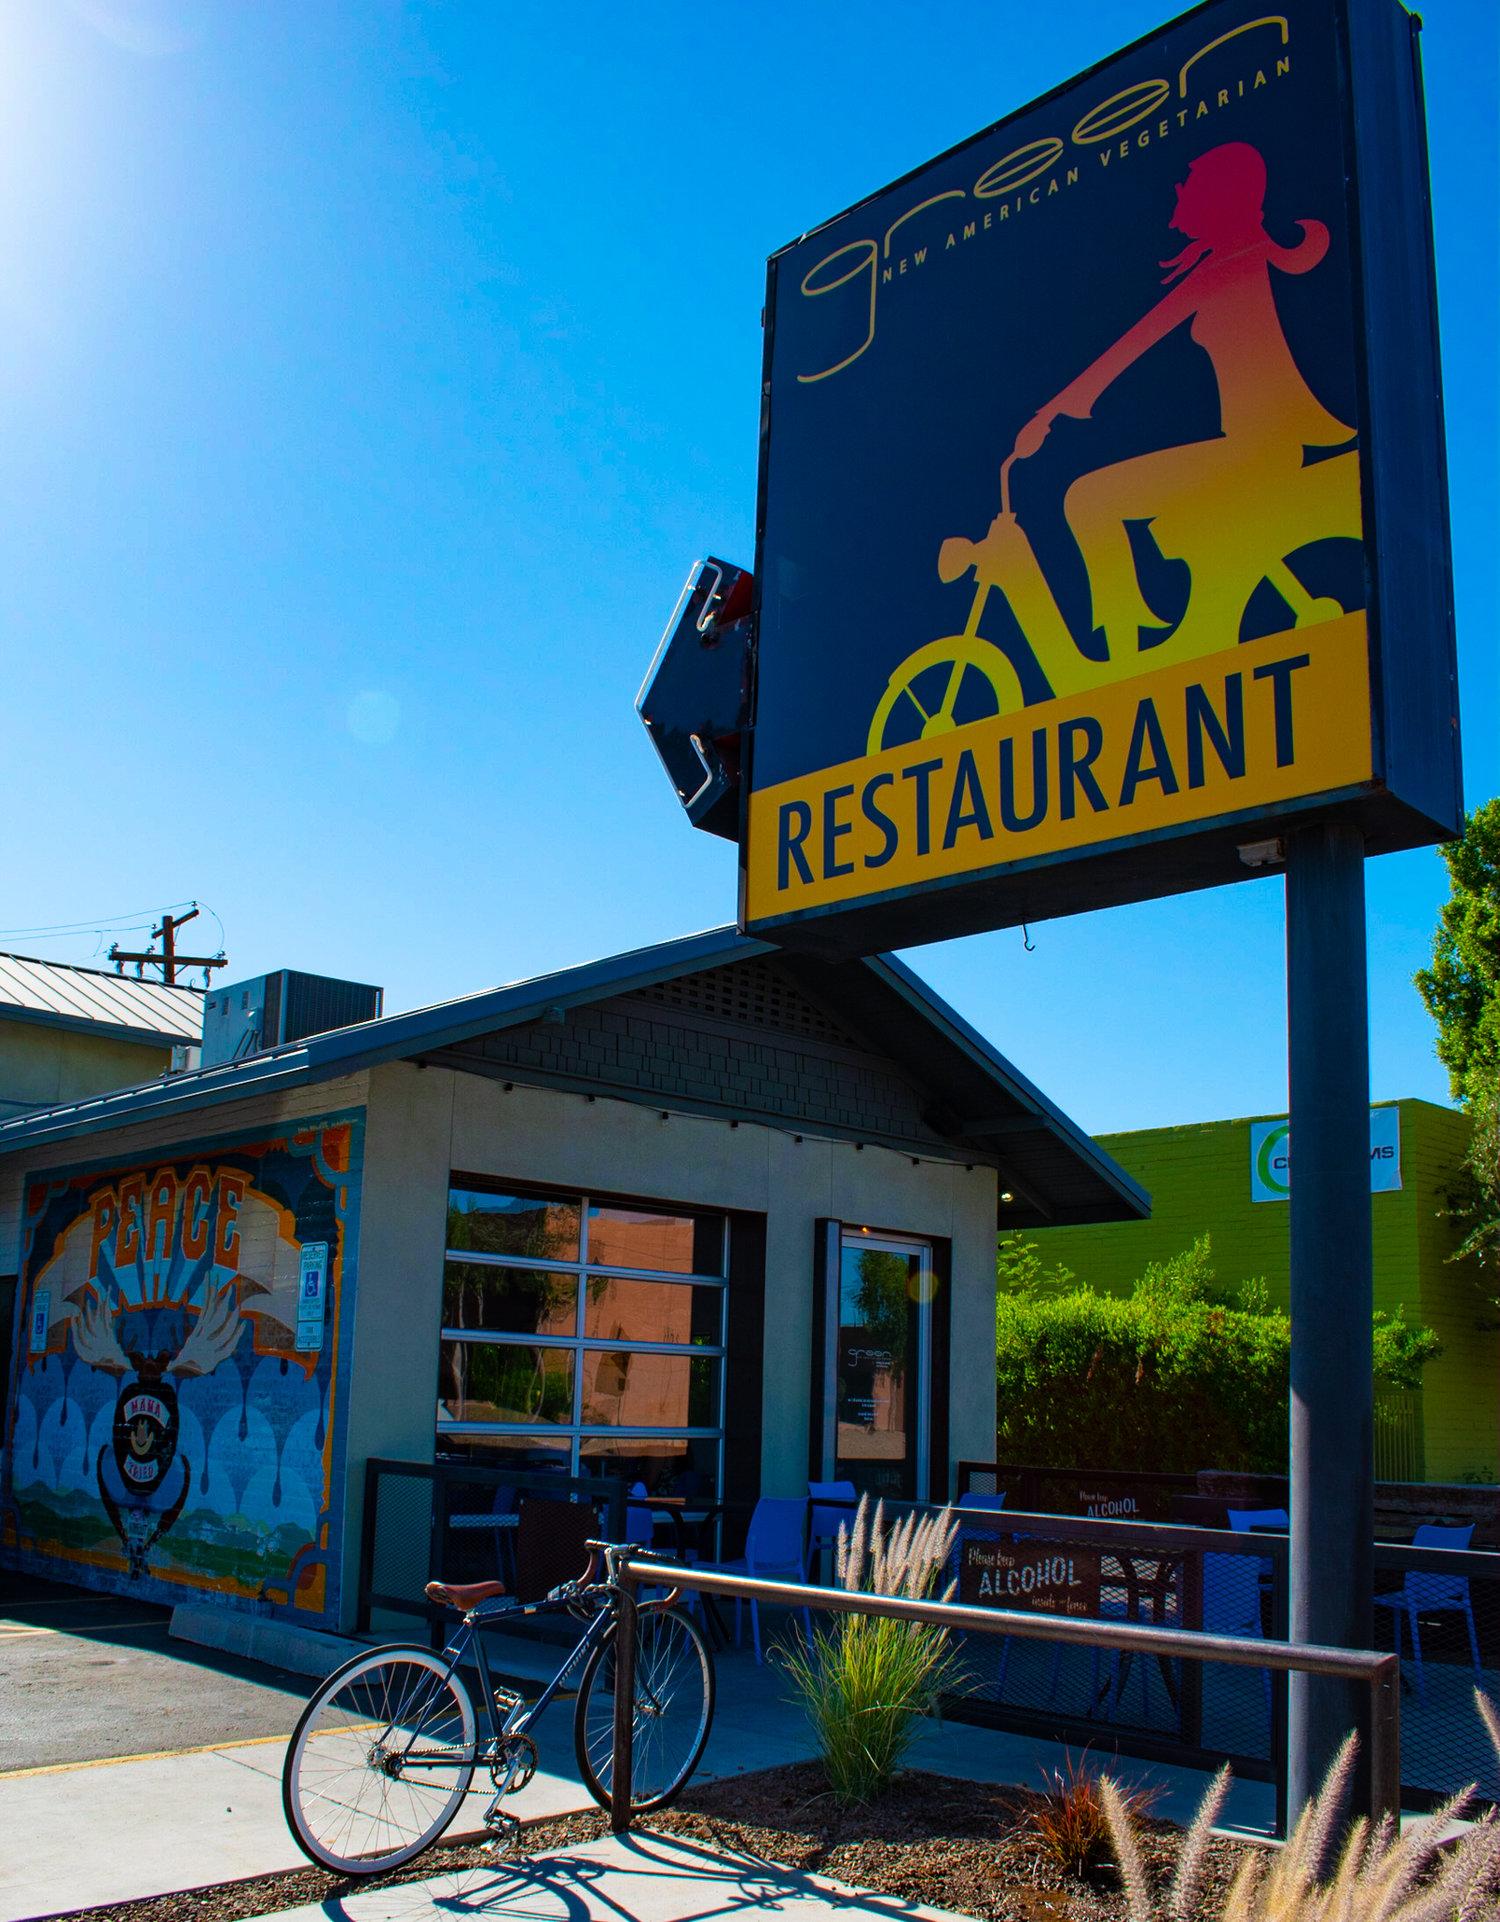 uprooted-traveler-arizona-phoenix-green-new-american-vegetarian-restaurant-vegan.jpg